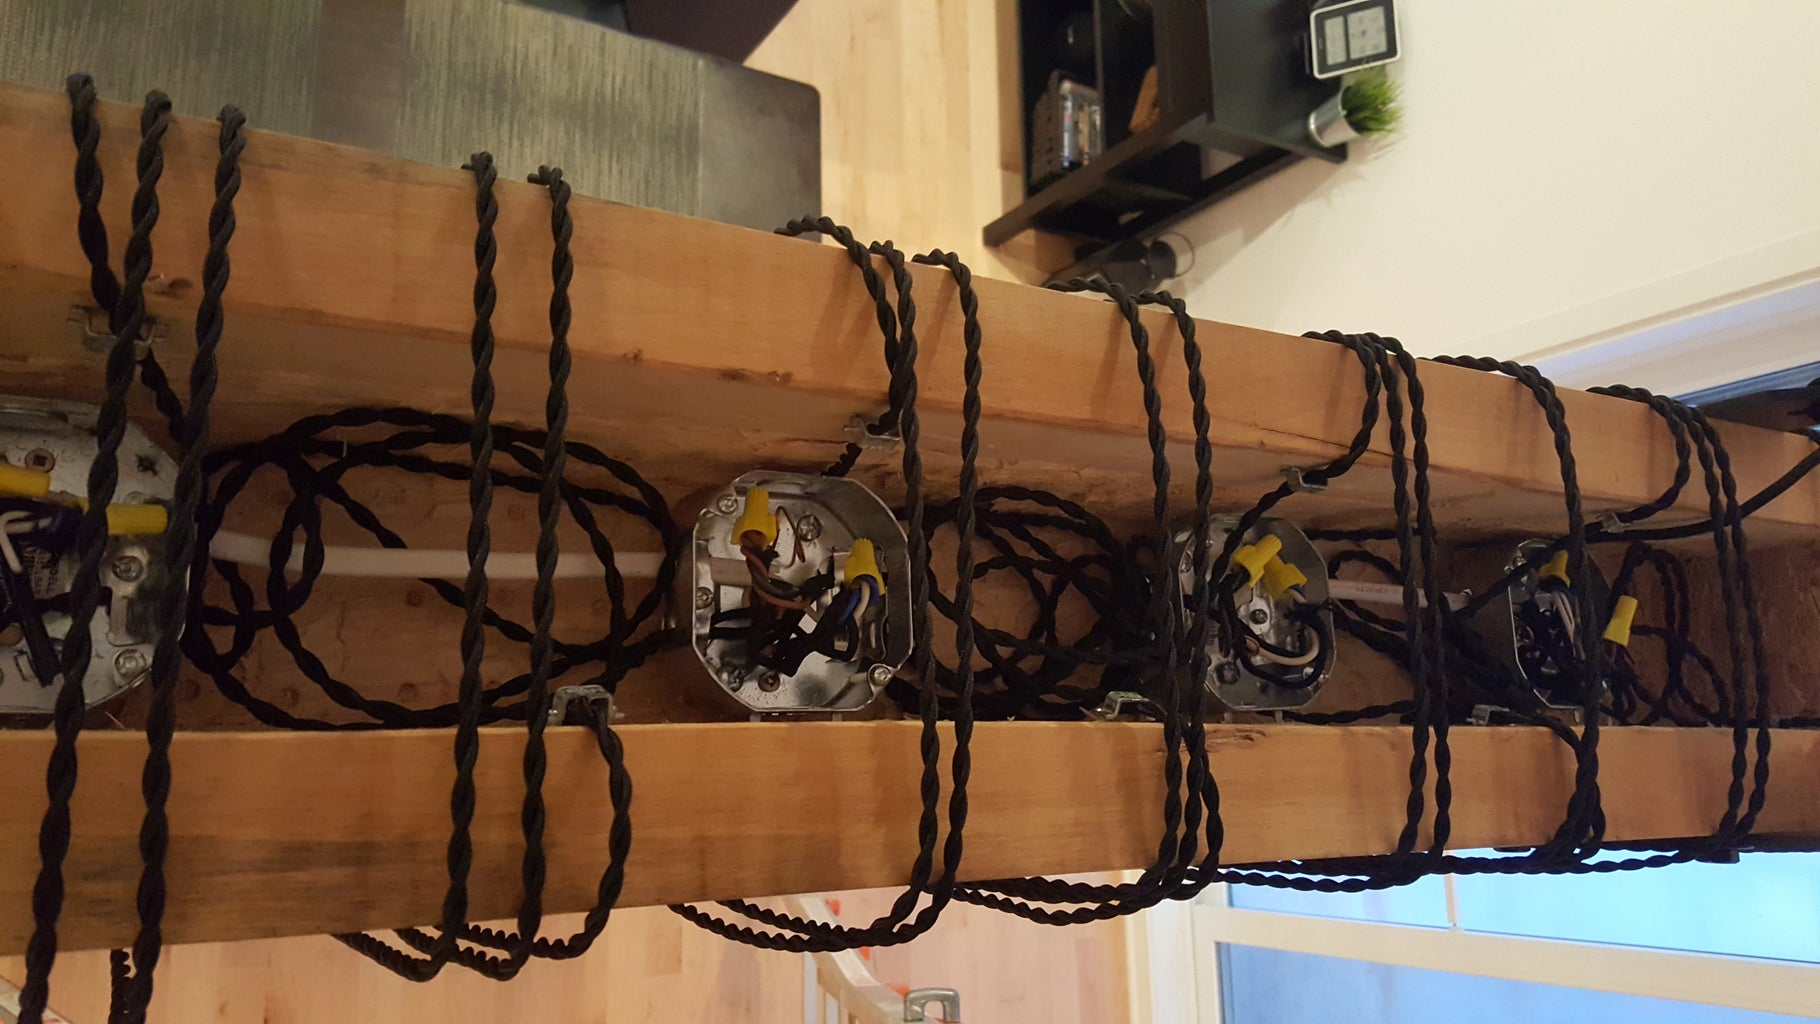 Wiring Lamp Sockets